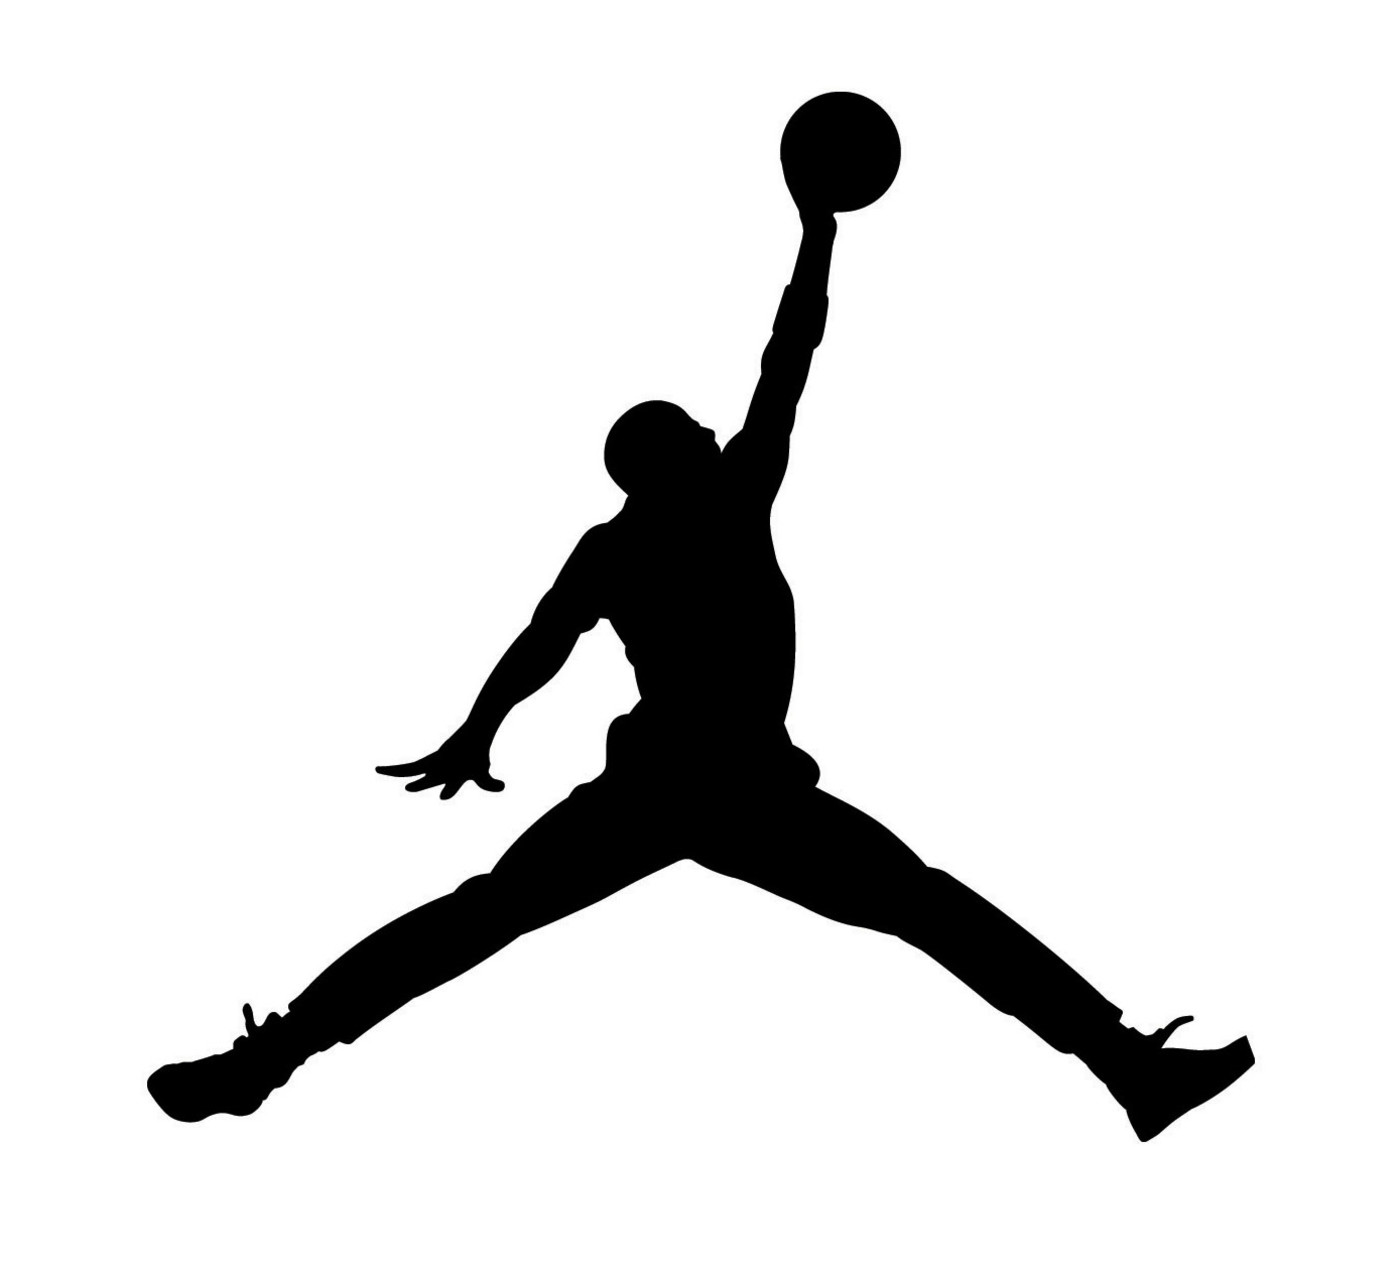 Логотип Jumpman